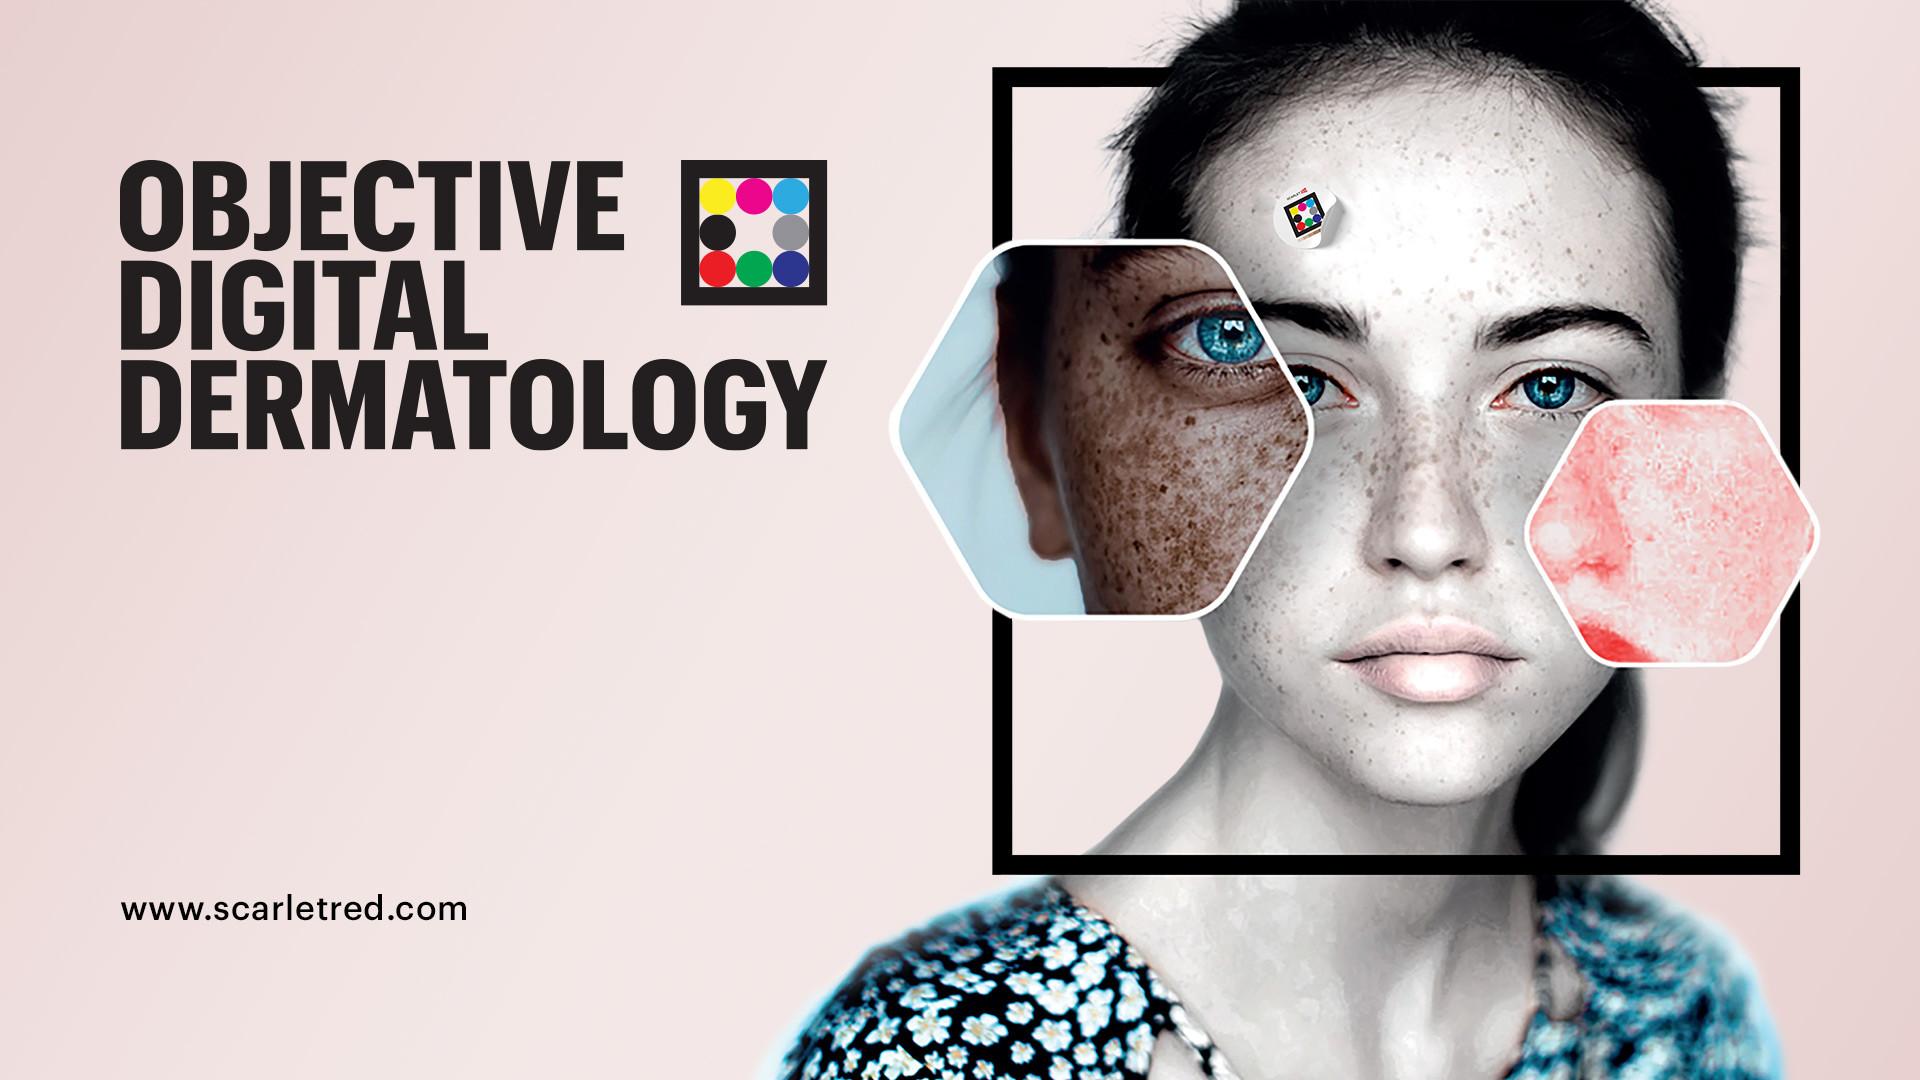 Objective digital dermatology by Scarletred